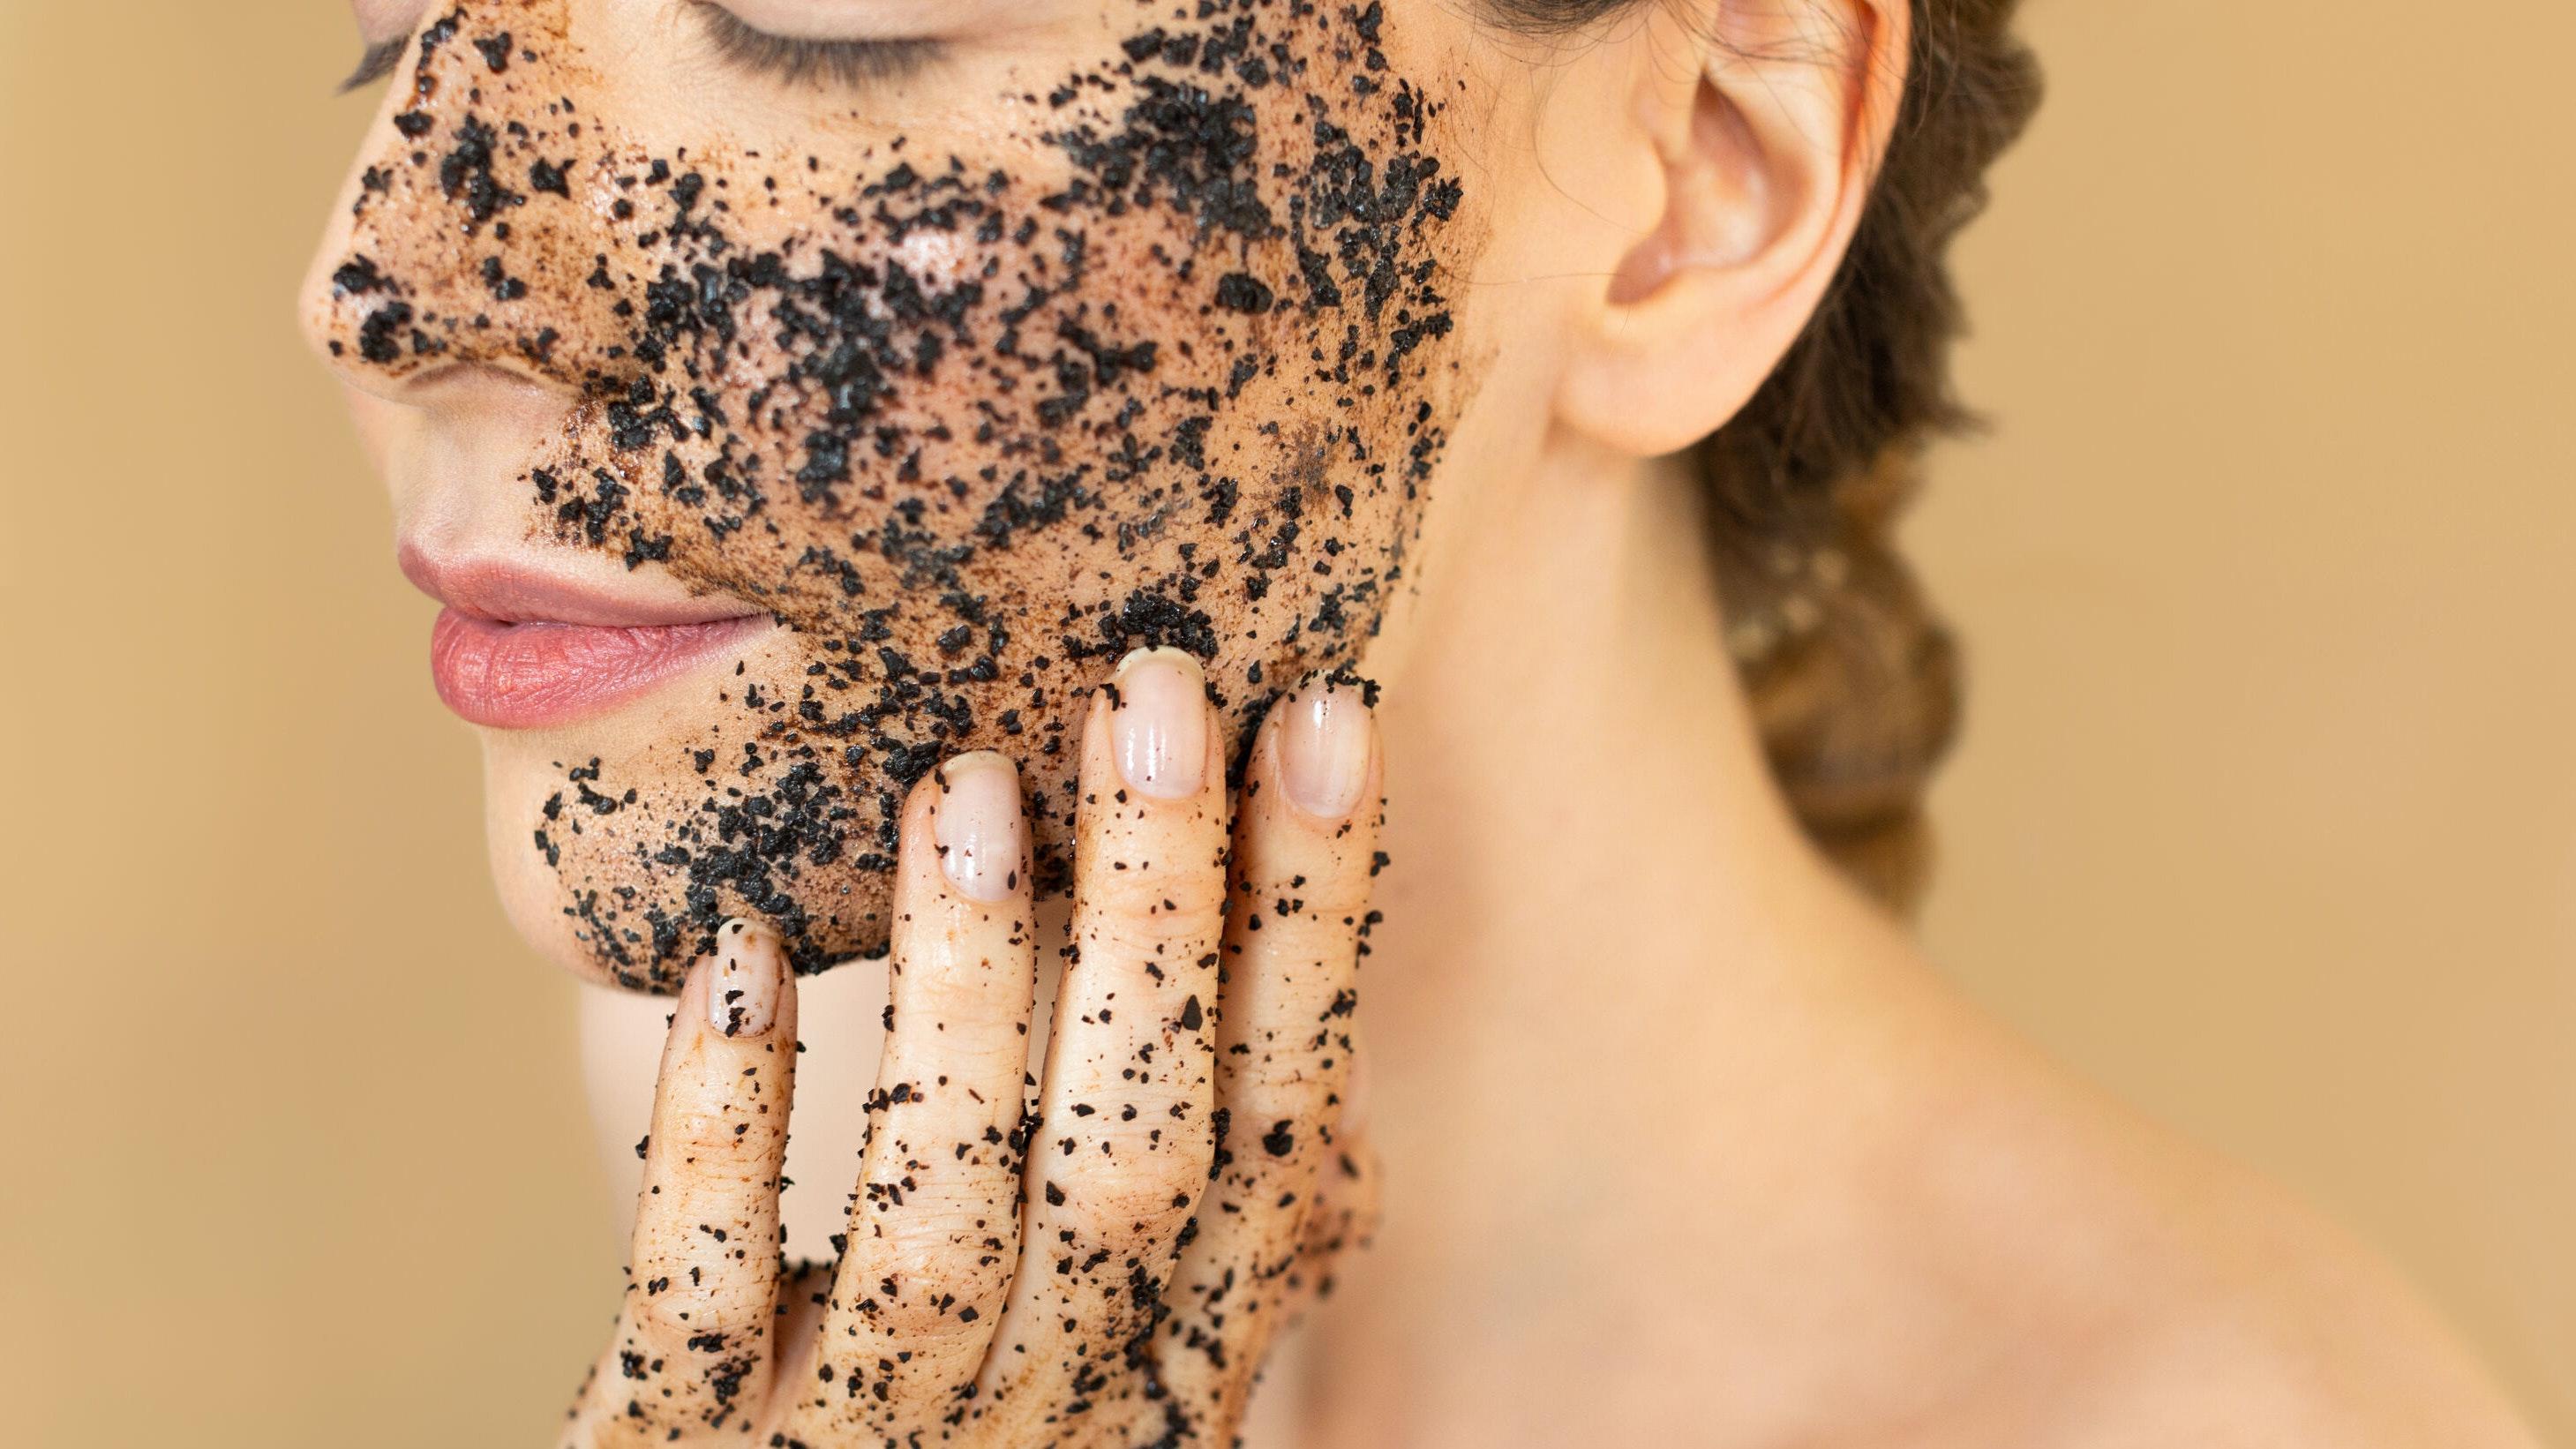 Woman Using Charcoal Face Scrub